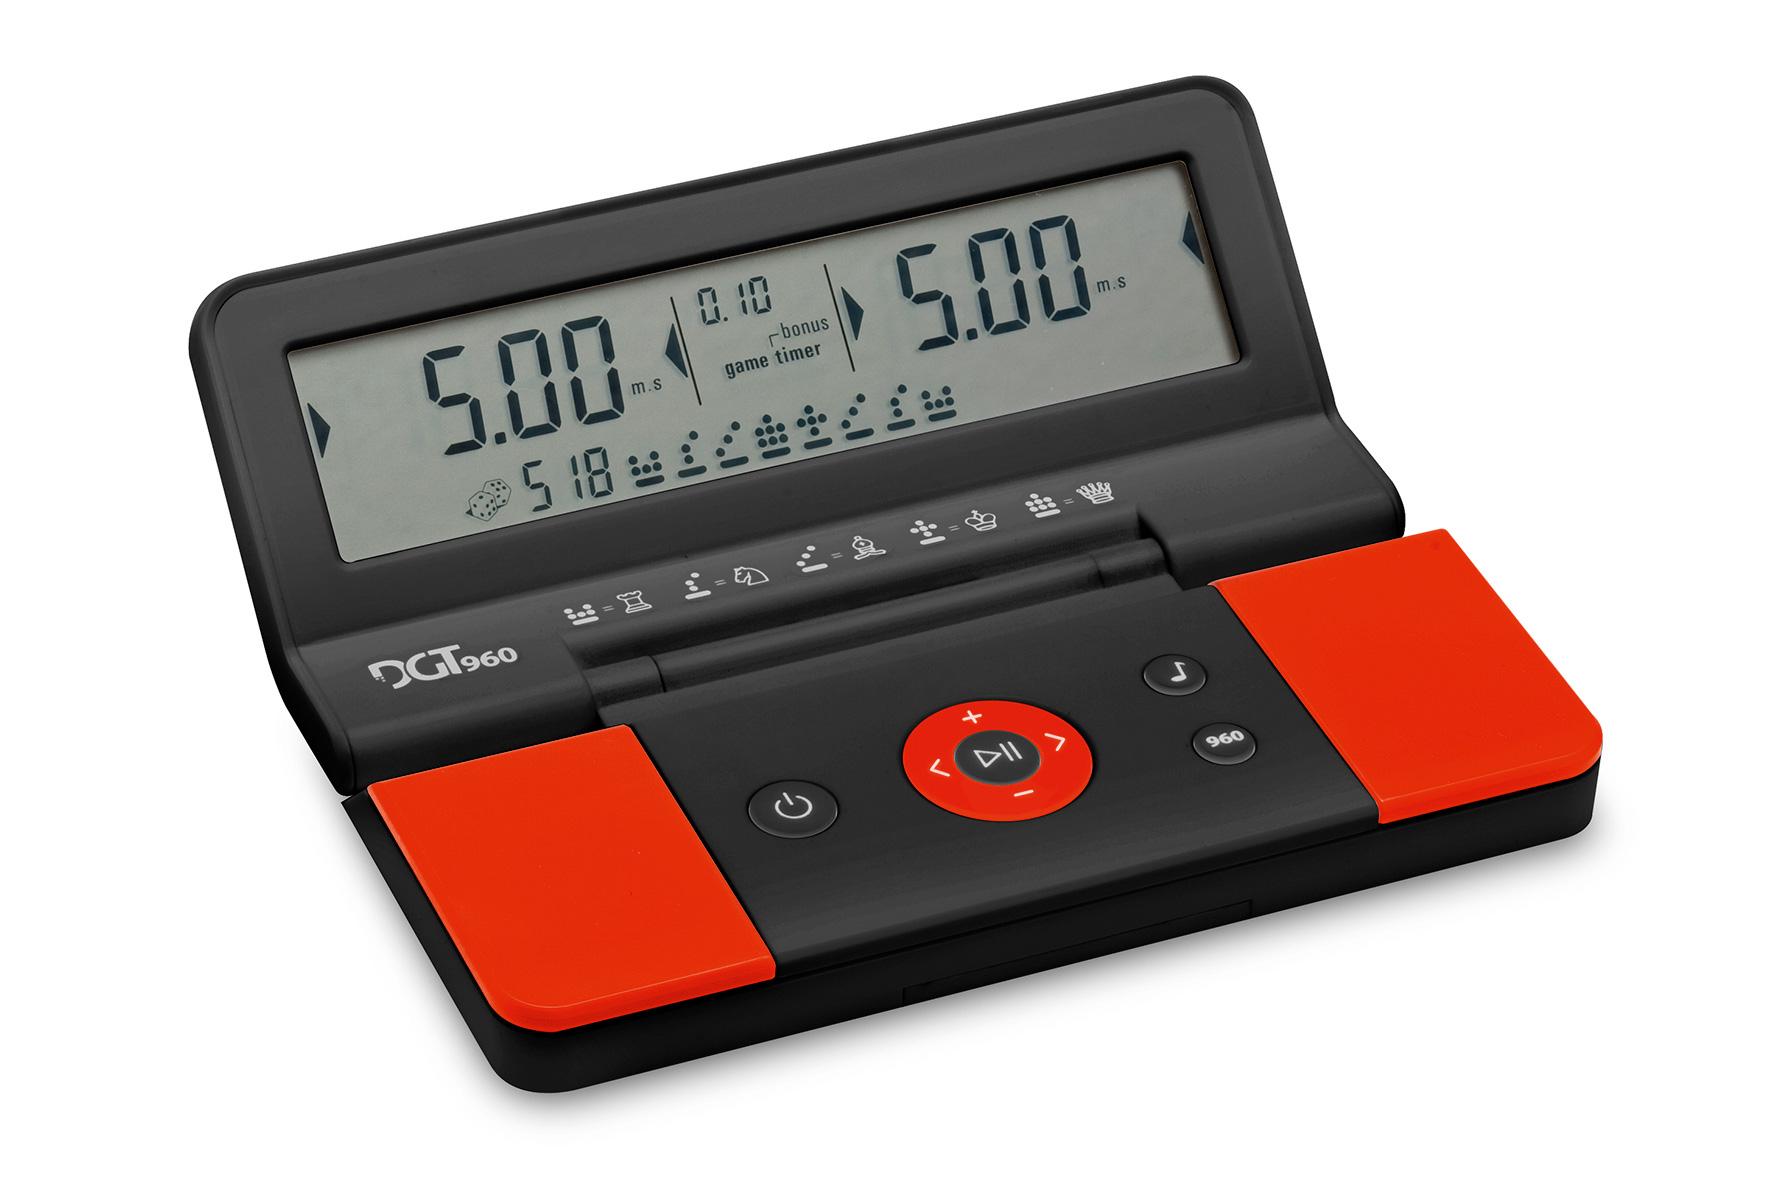 DGT-960-Black-Red